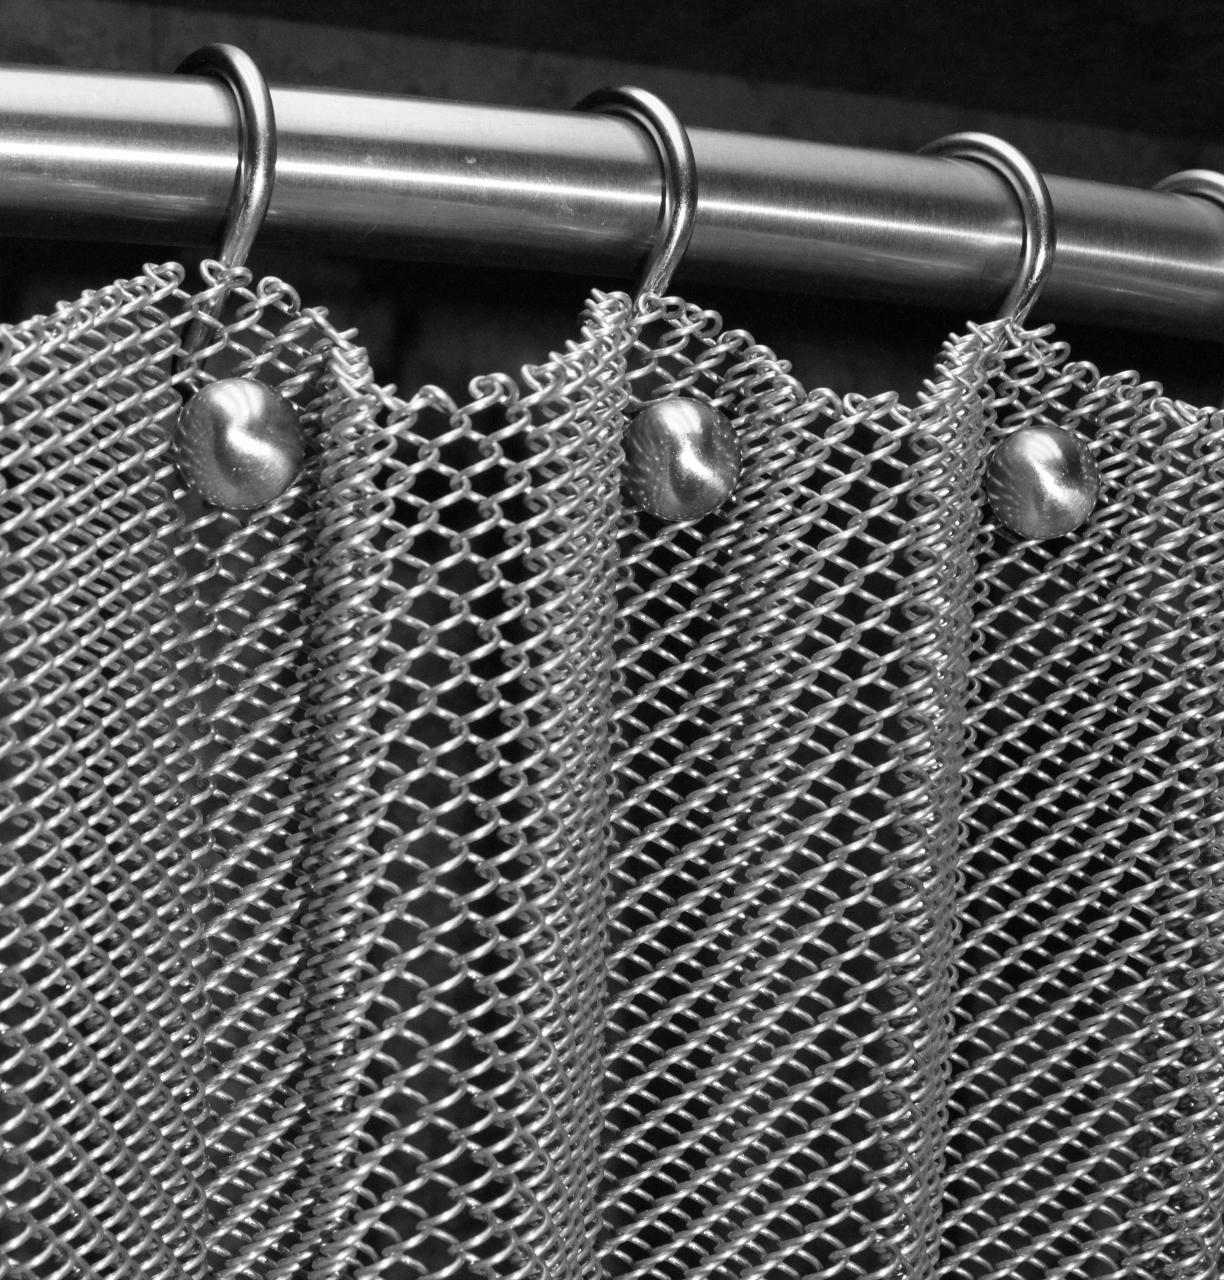 Decorative Wire Mesh Aluminum Chain Curtain Weave Metal Fabrics Buy Flexible Metal Mesh Fabric Decorative Metal Chain Door Curtain Metal Ball Chain